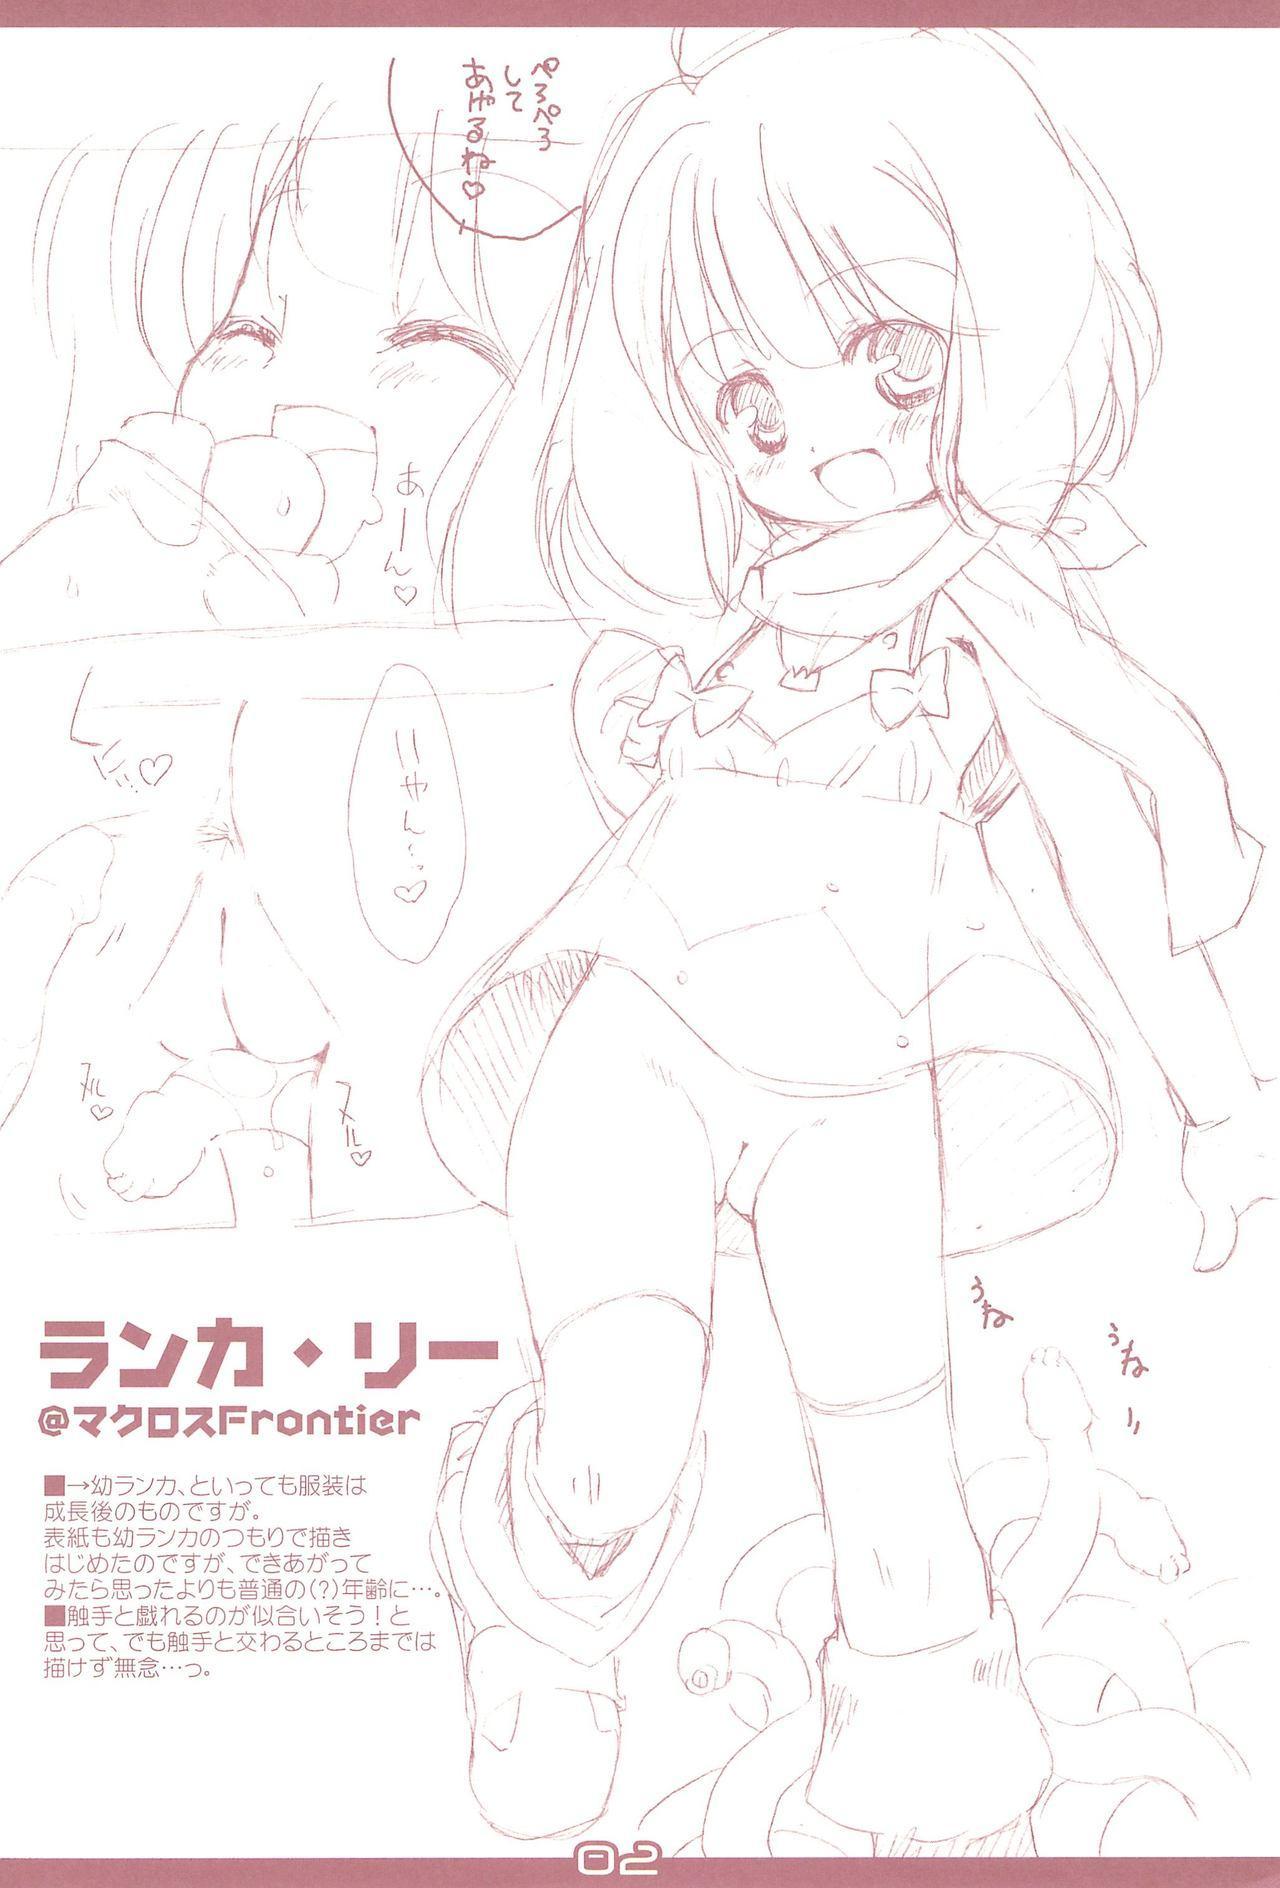 (Puniket 18) [Chokudokan (MARCY Dog, Hormone Koijirou) Rakugakitan 2 (Various) 1